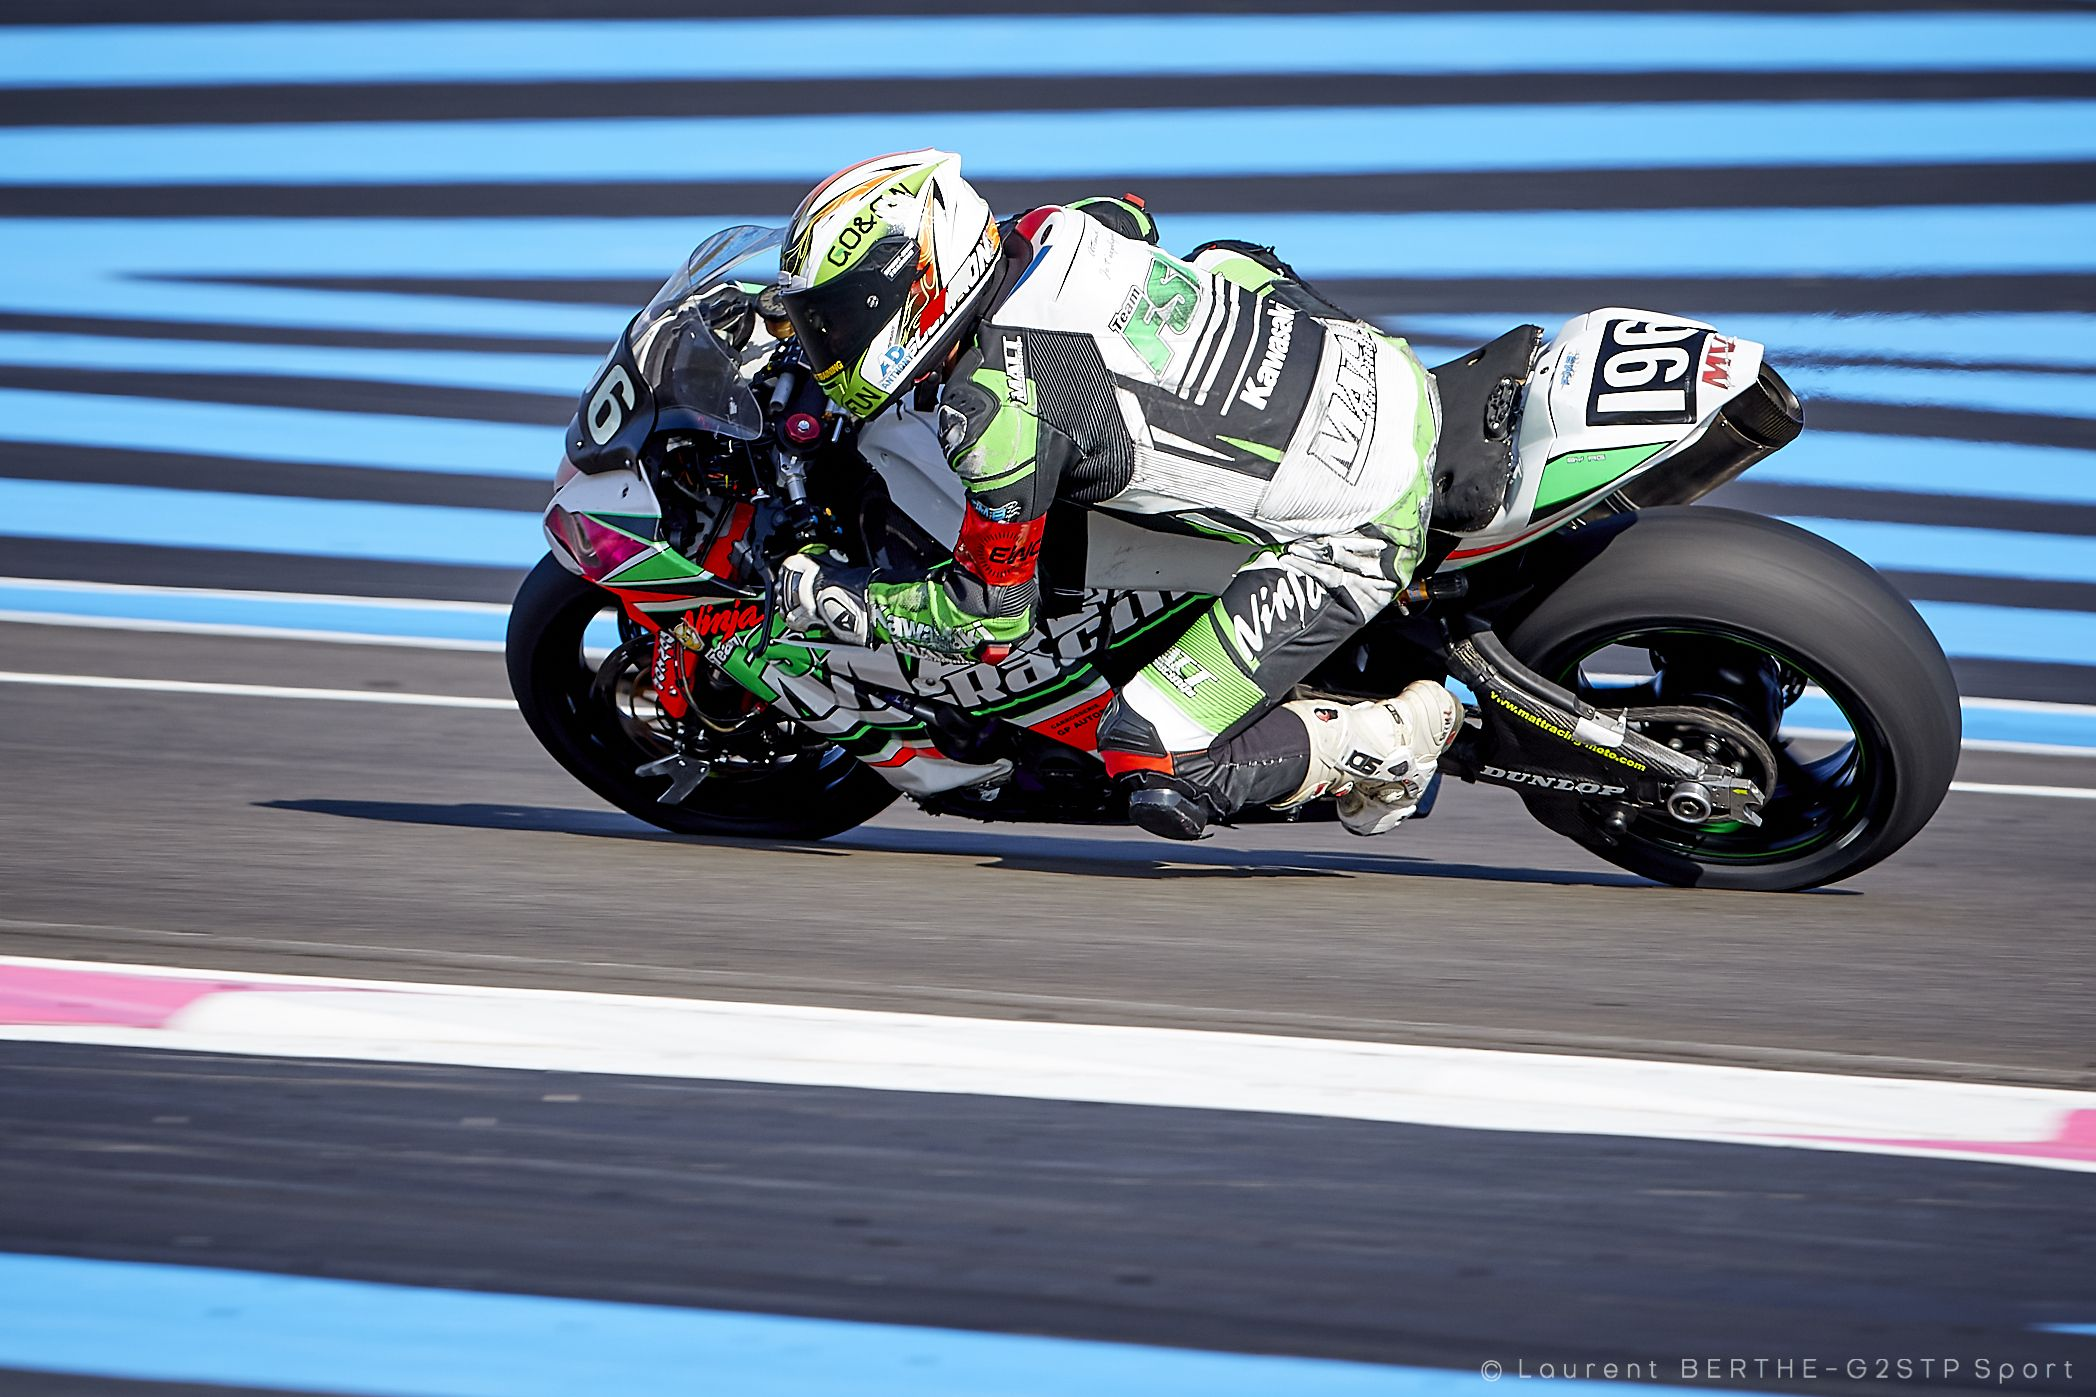 Team Fsb Matt Racing Motorcycle Team Sport Matt Racing Motogp Moto2 Moto3 Motorsport Mat Combinaison Moto Course Moto